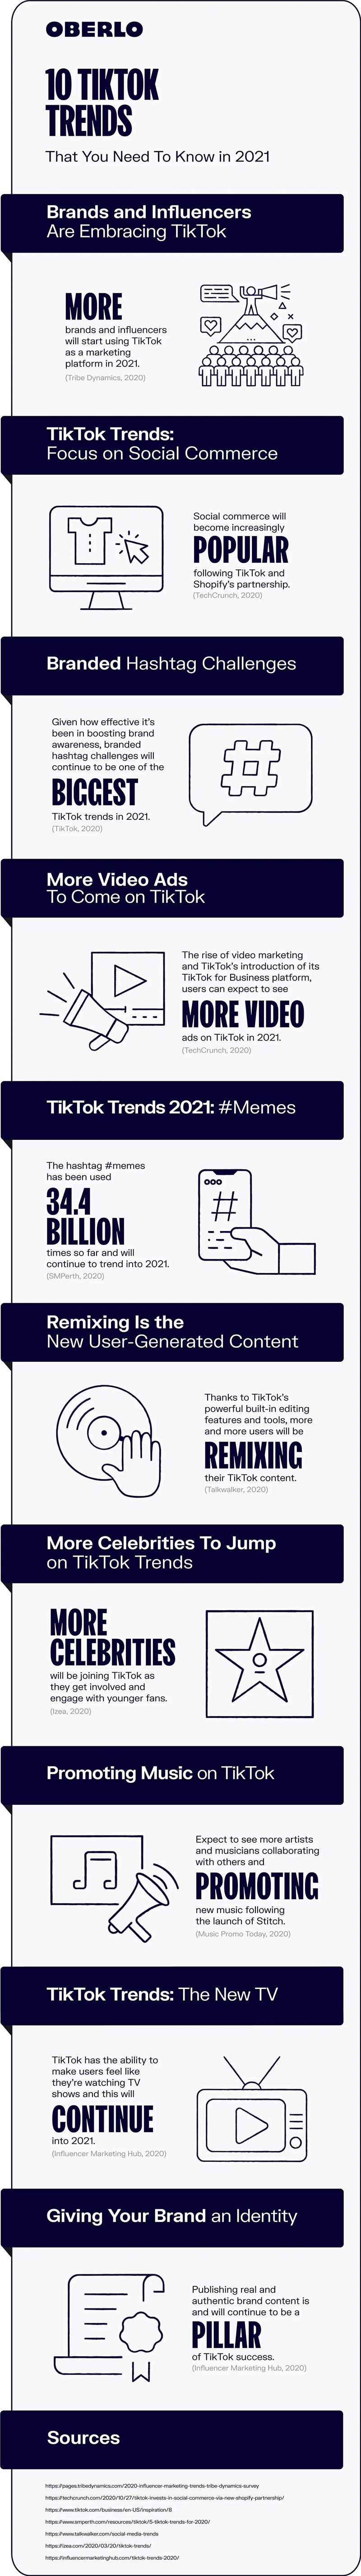 TikTok Trends infographic